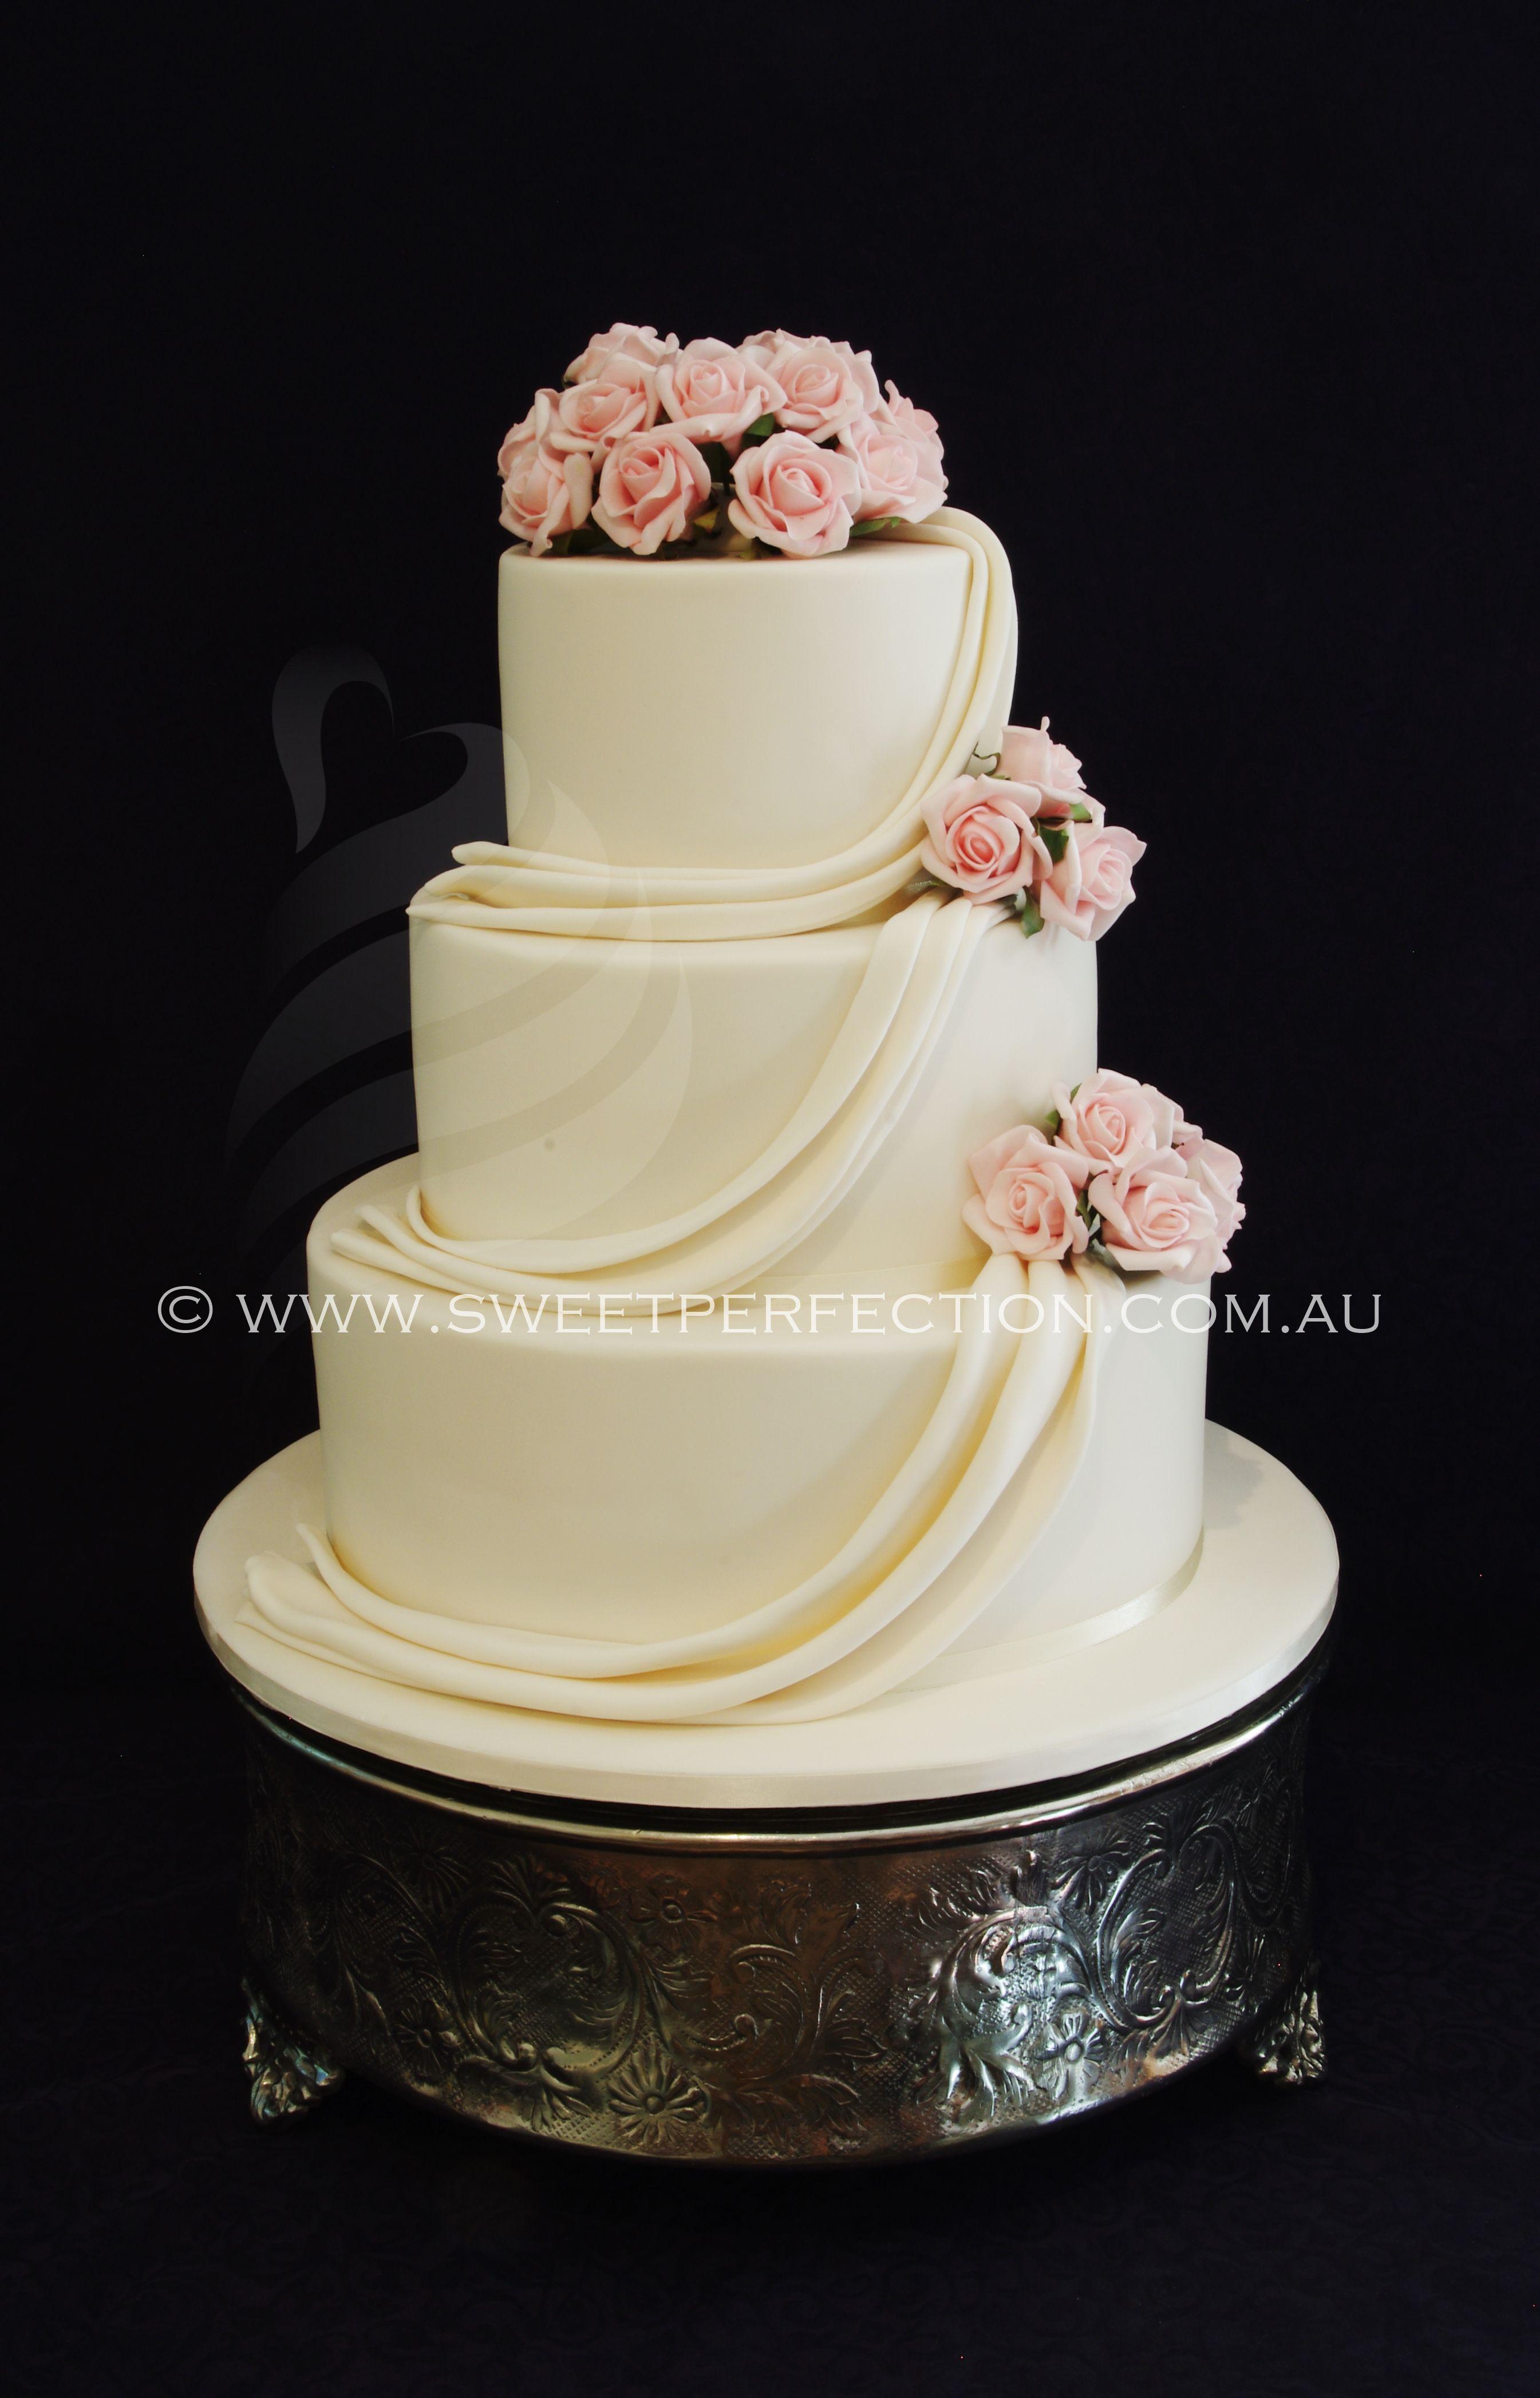 Newcastle Nsw Wedding Cakes - 5000+ Simple Wedding Cakes